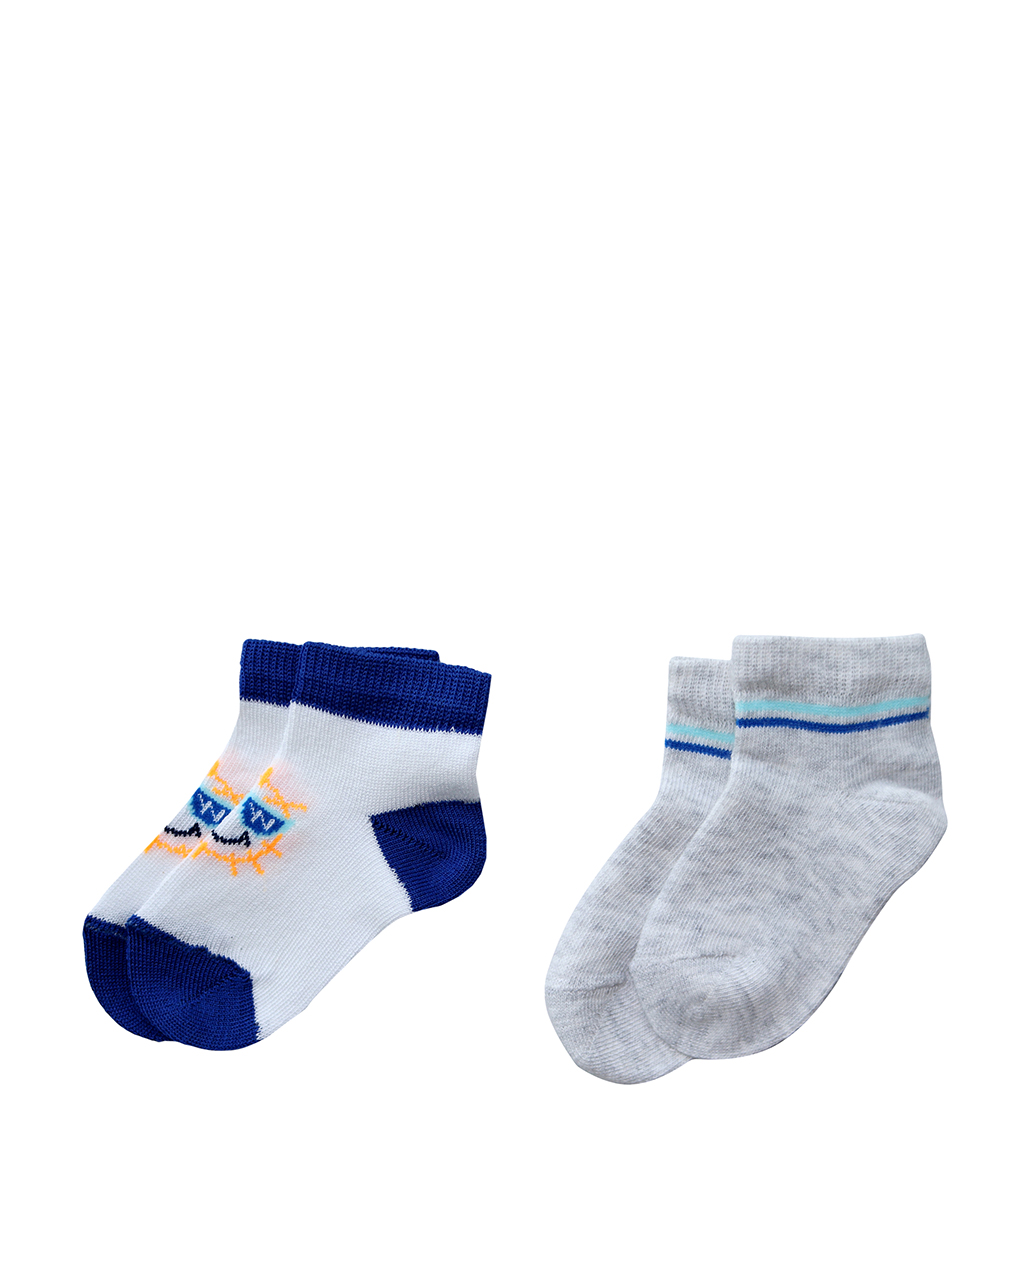 Pack x2 calze corte in cotone - Prénatal